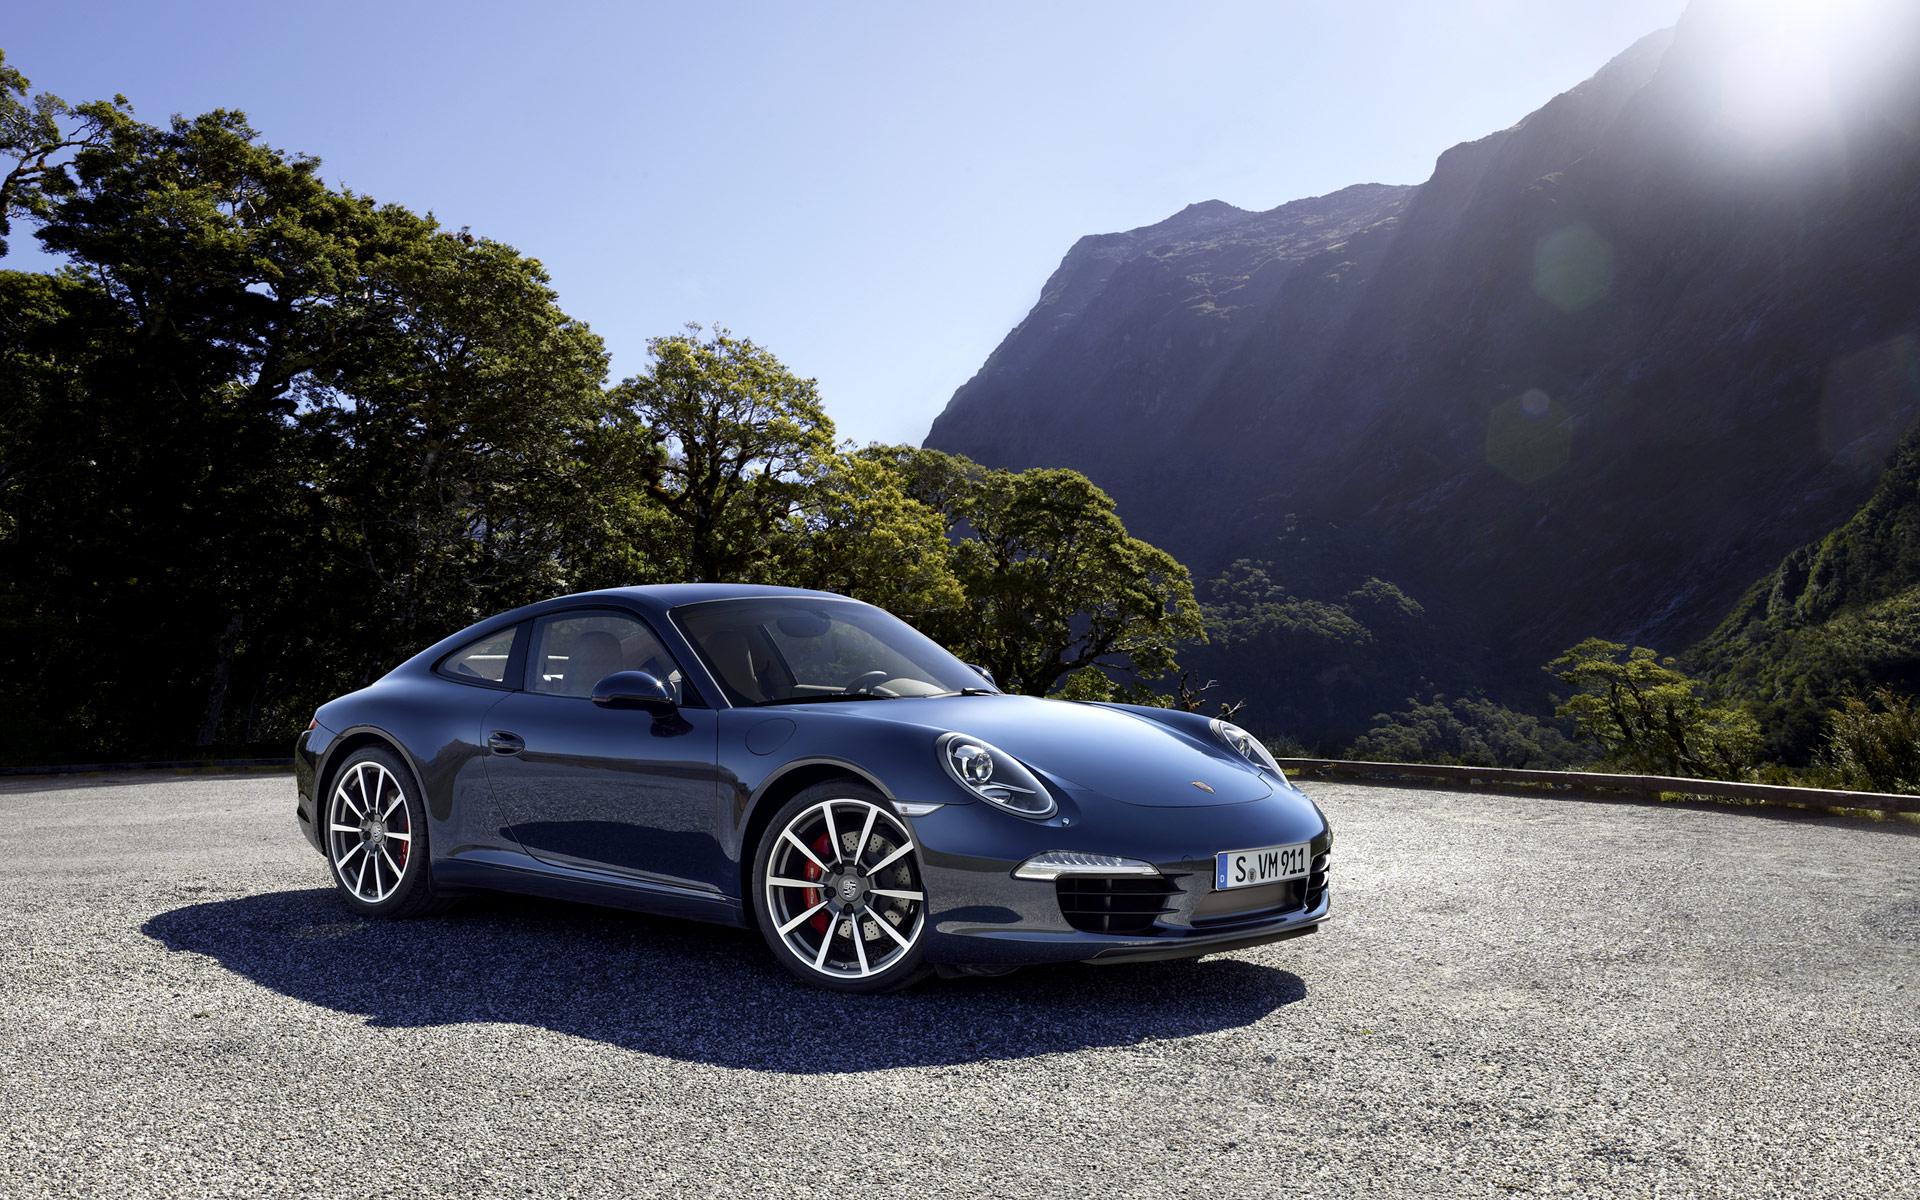 Porsche-Carrera-S-Desktop-Wallpaper-wallpaper-wp4809703